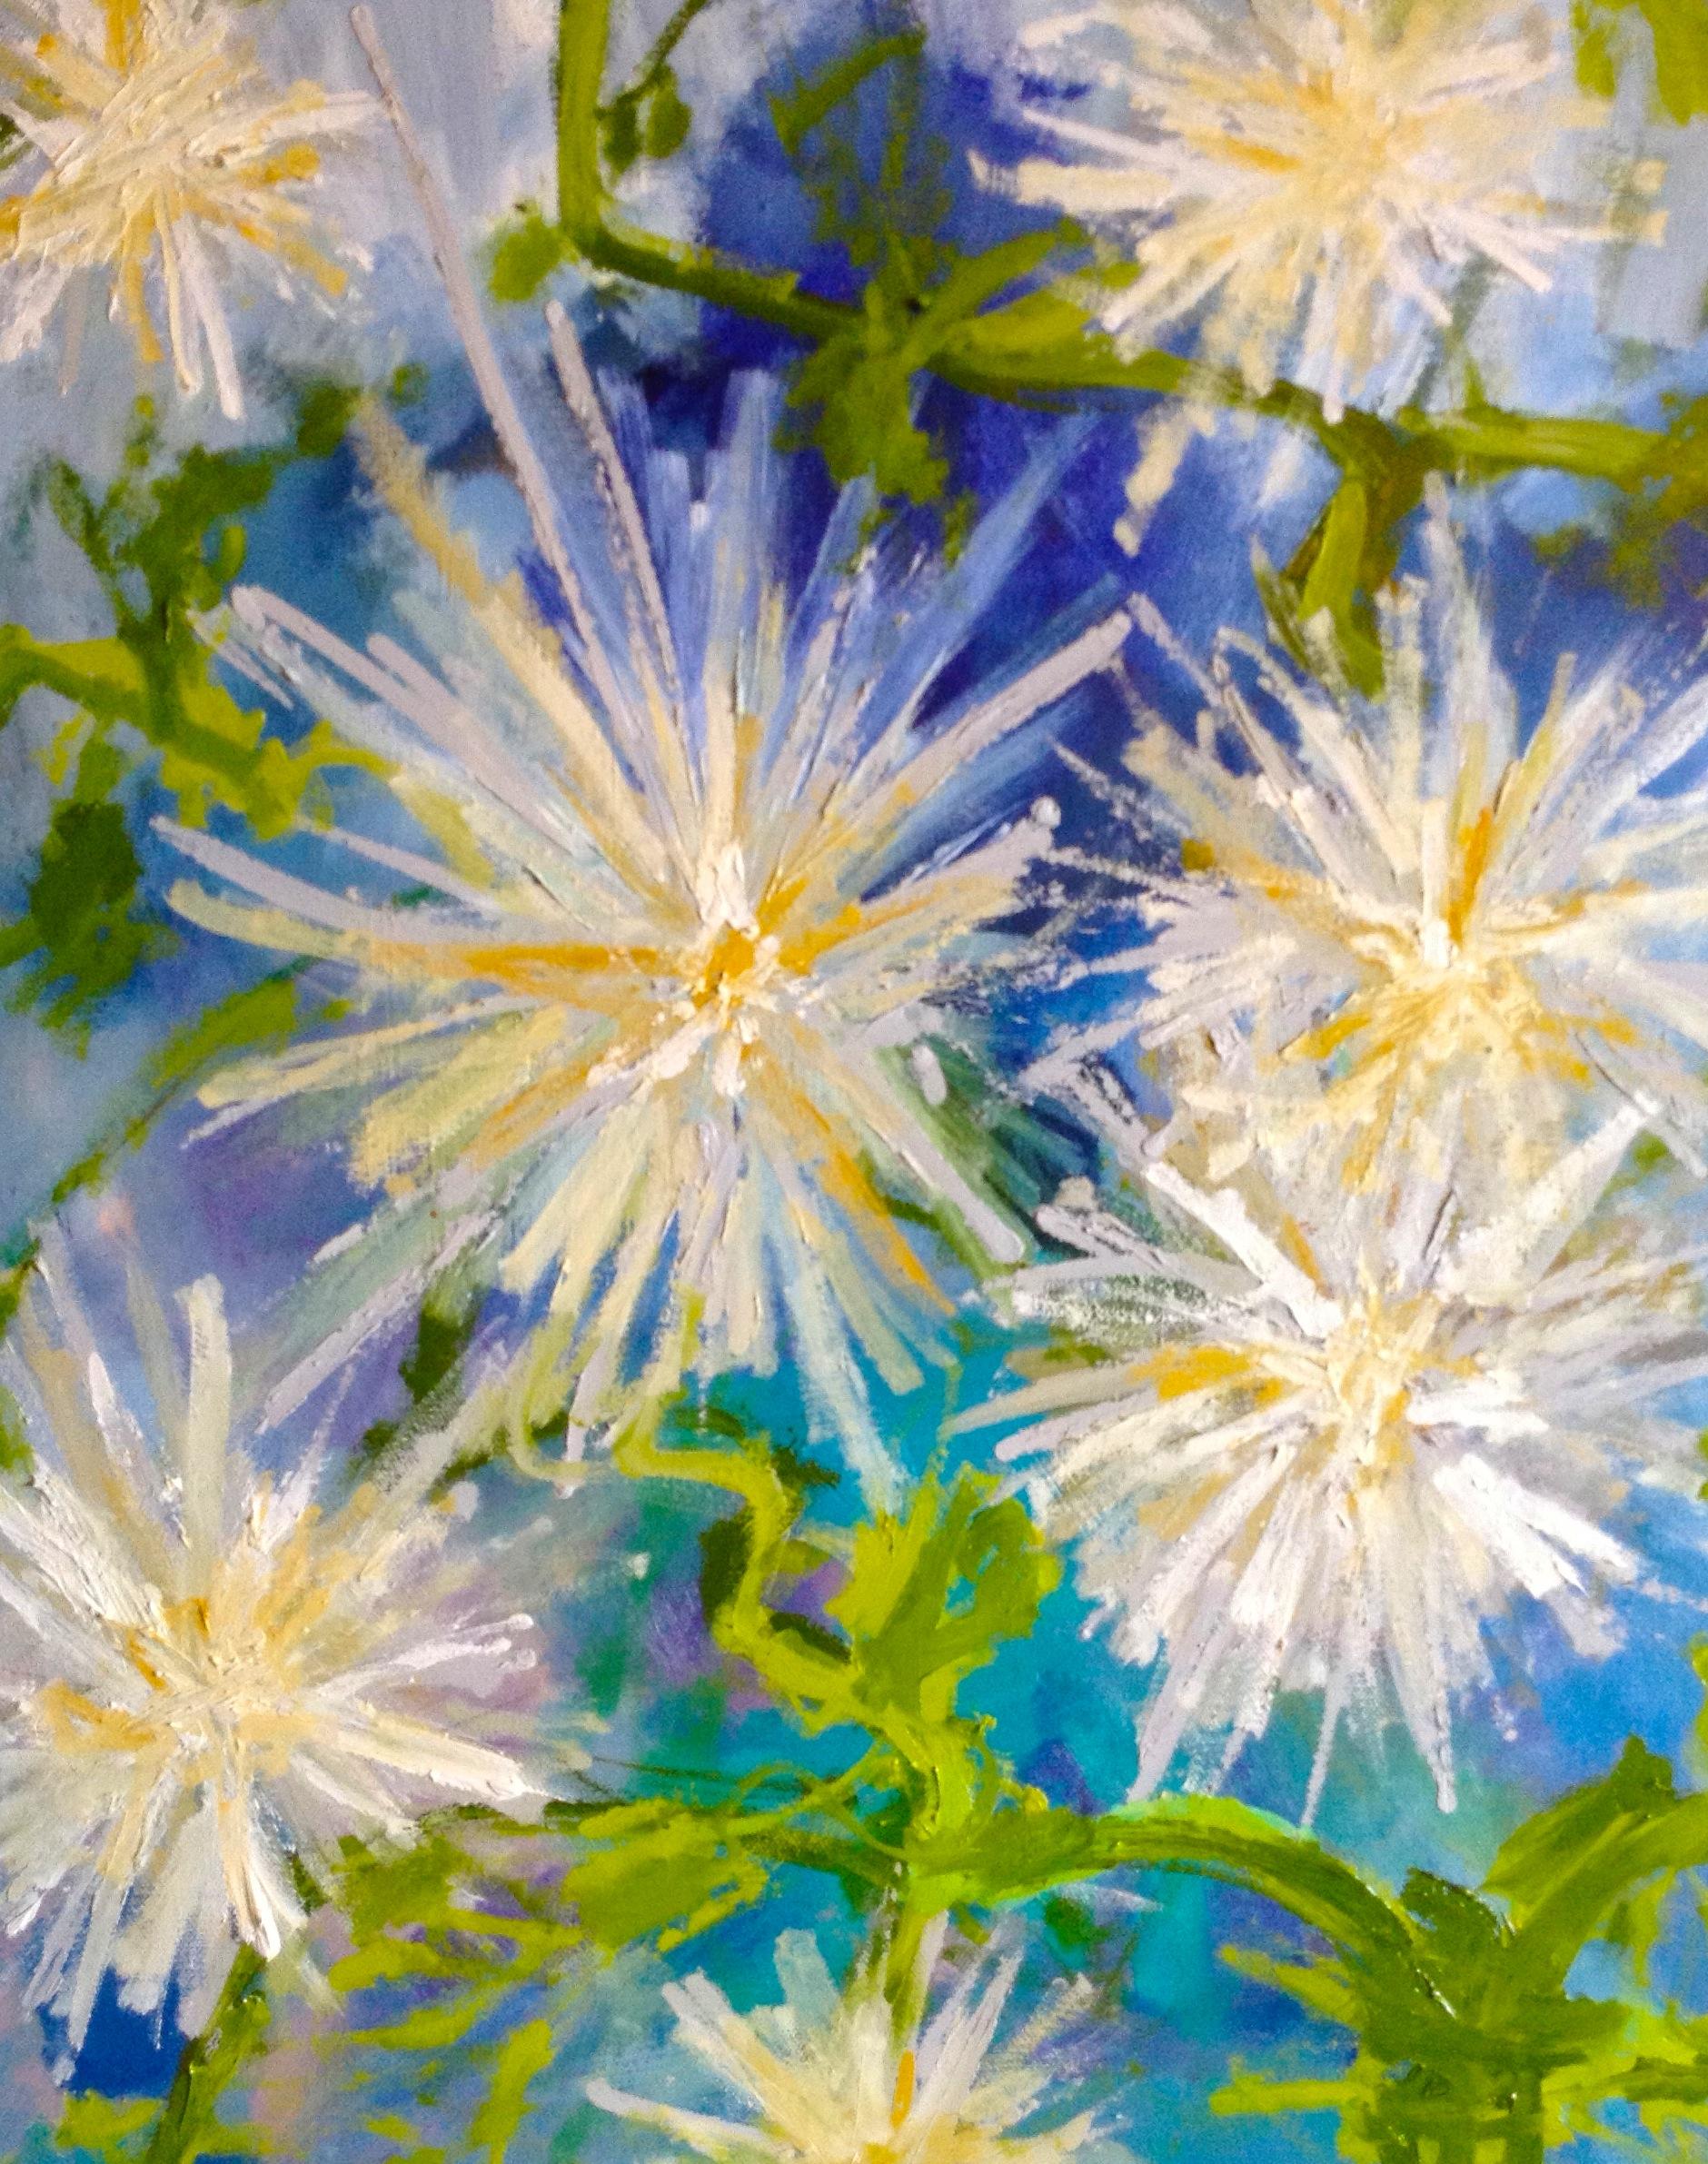 Tilte: Flower Web